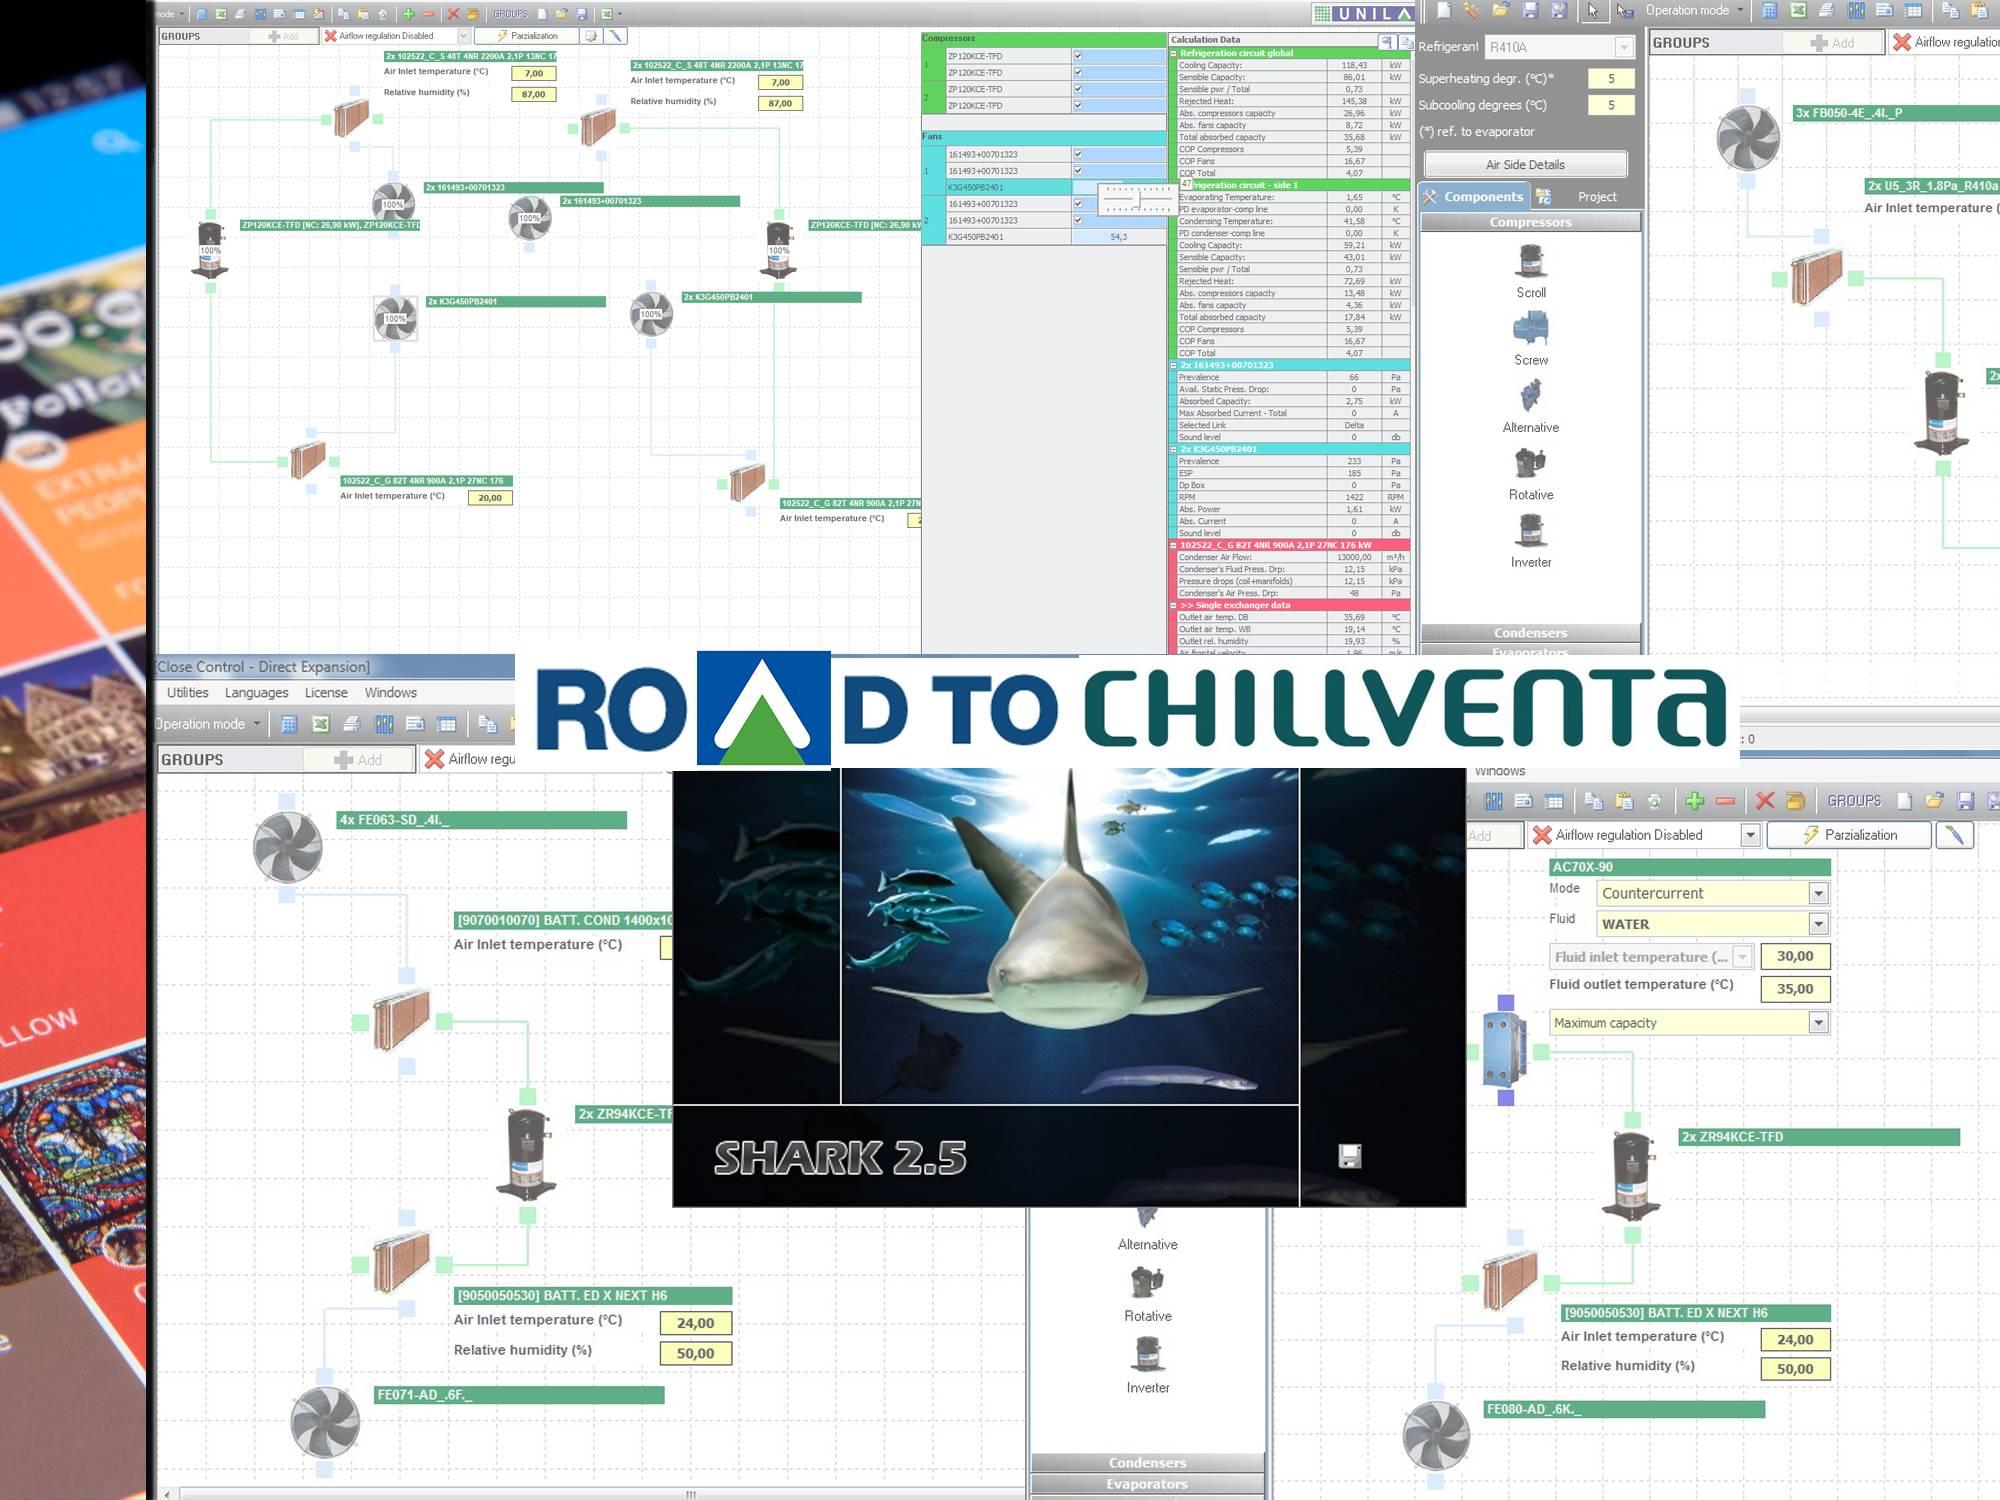 Road To Chillventa 2018 Shark Unilab Heat Transfer Software Circuit Design Suite Screenshot 13